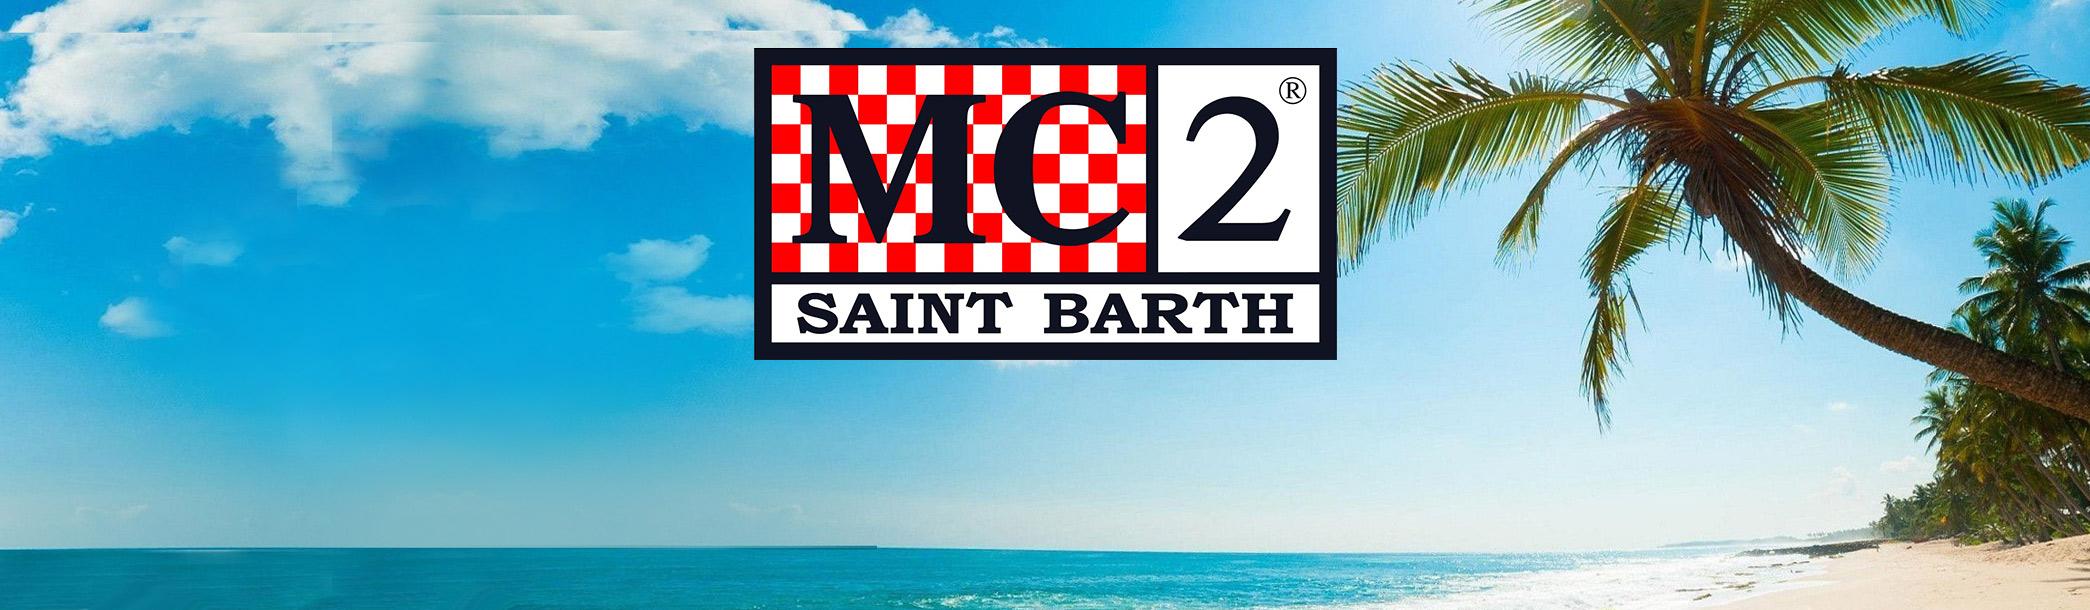 Make A Splash with MC2 Saint Barth